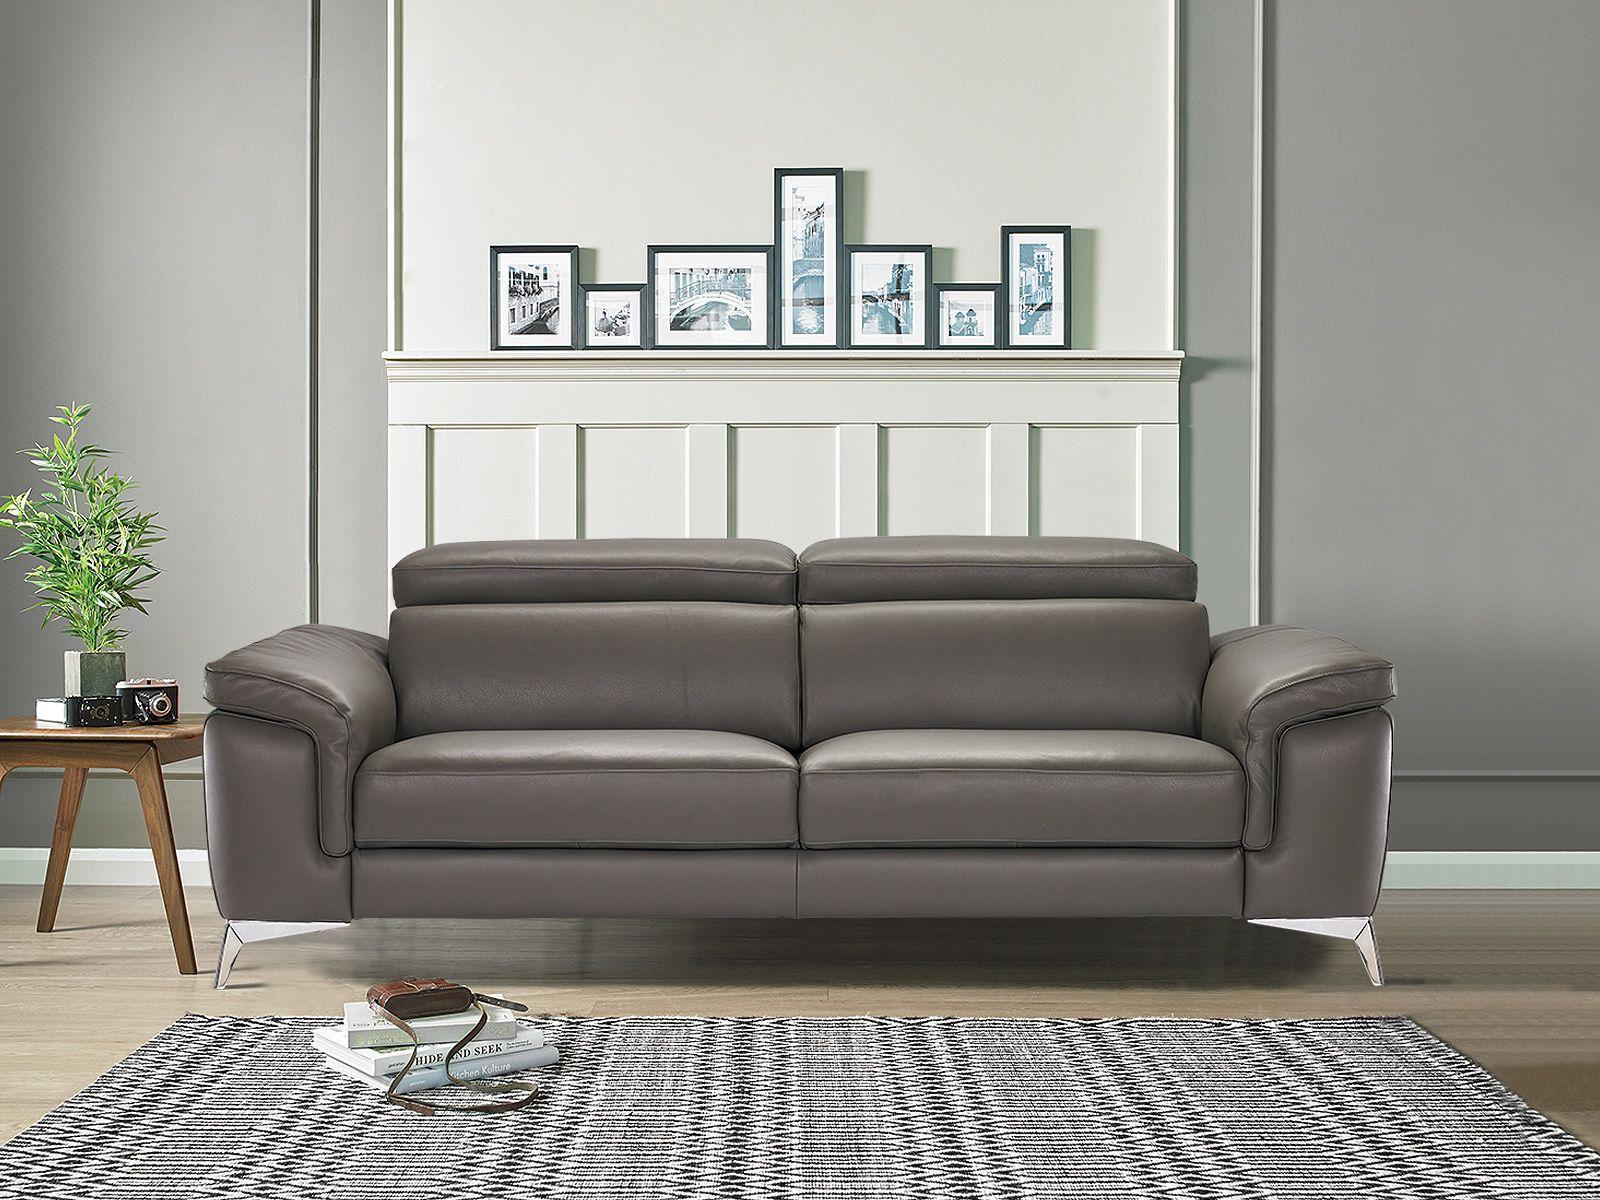 Schön CHESTER SOFA   Furniture   Pinterest   Sofa Sessel, Farbenspiel Und Sessel